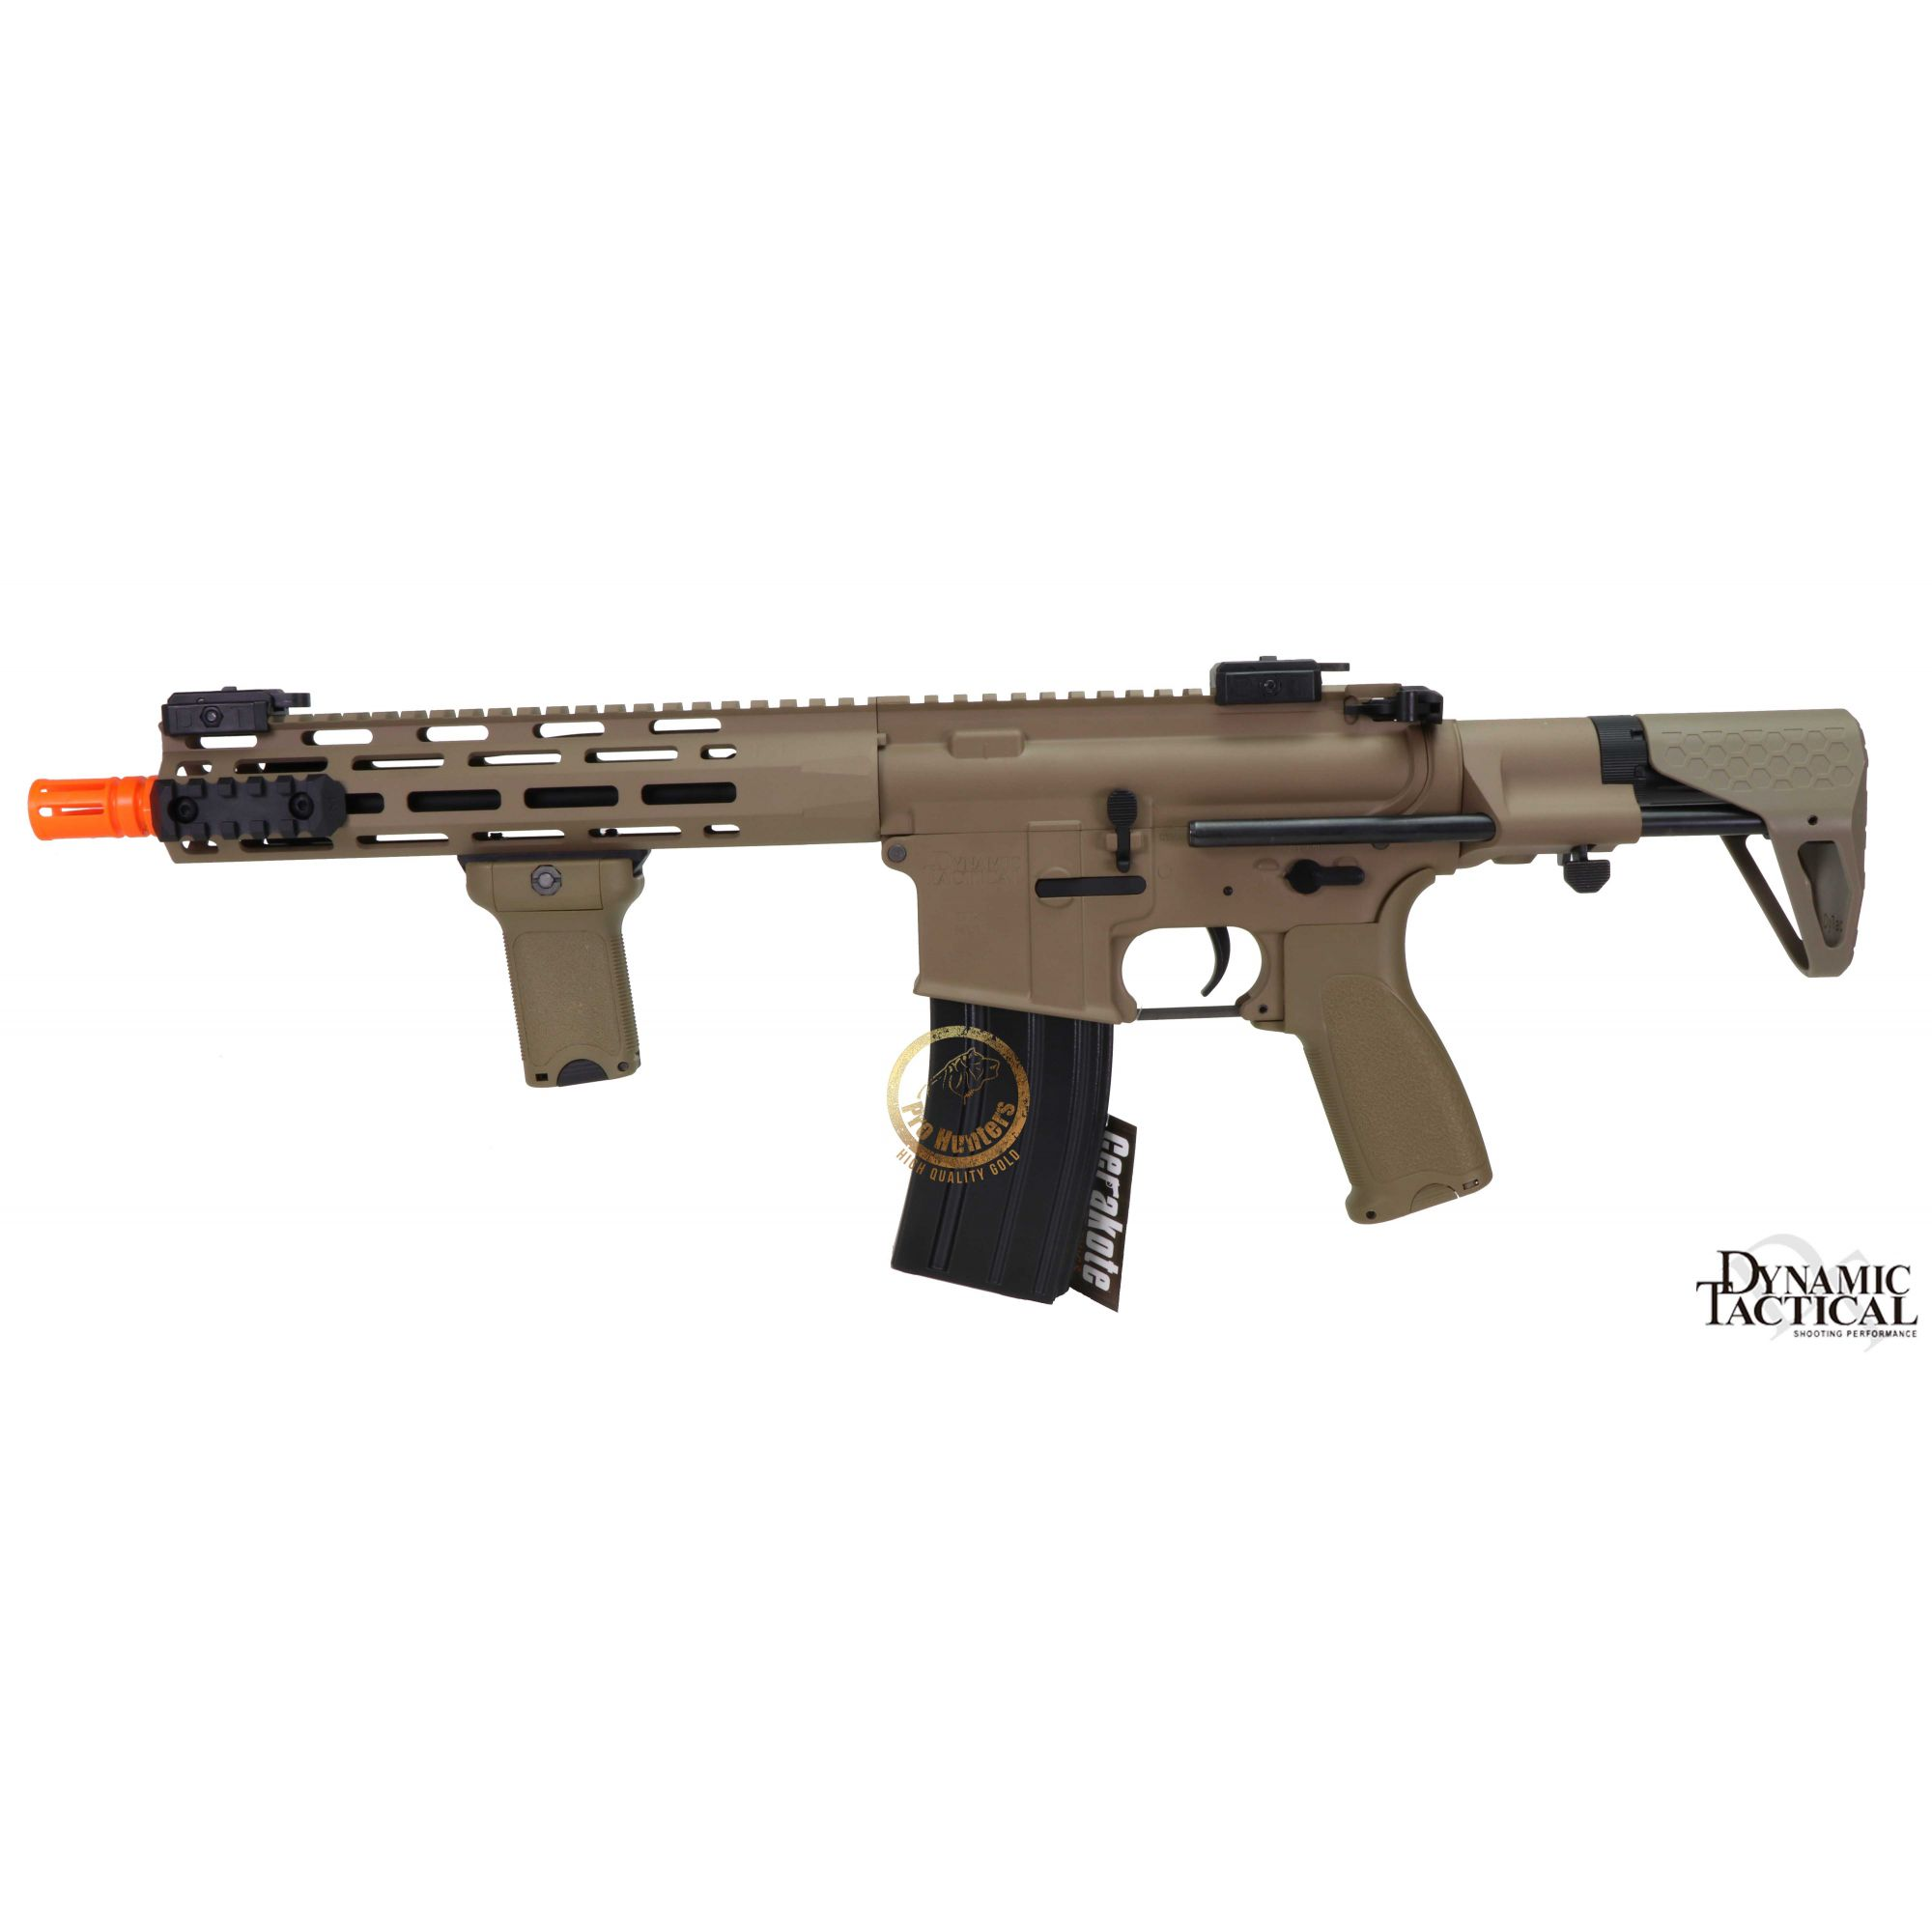 Rifle Airsoft Dytac EVO Standard M4 SBR Type A - Magpul Dark Earth